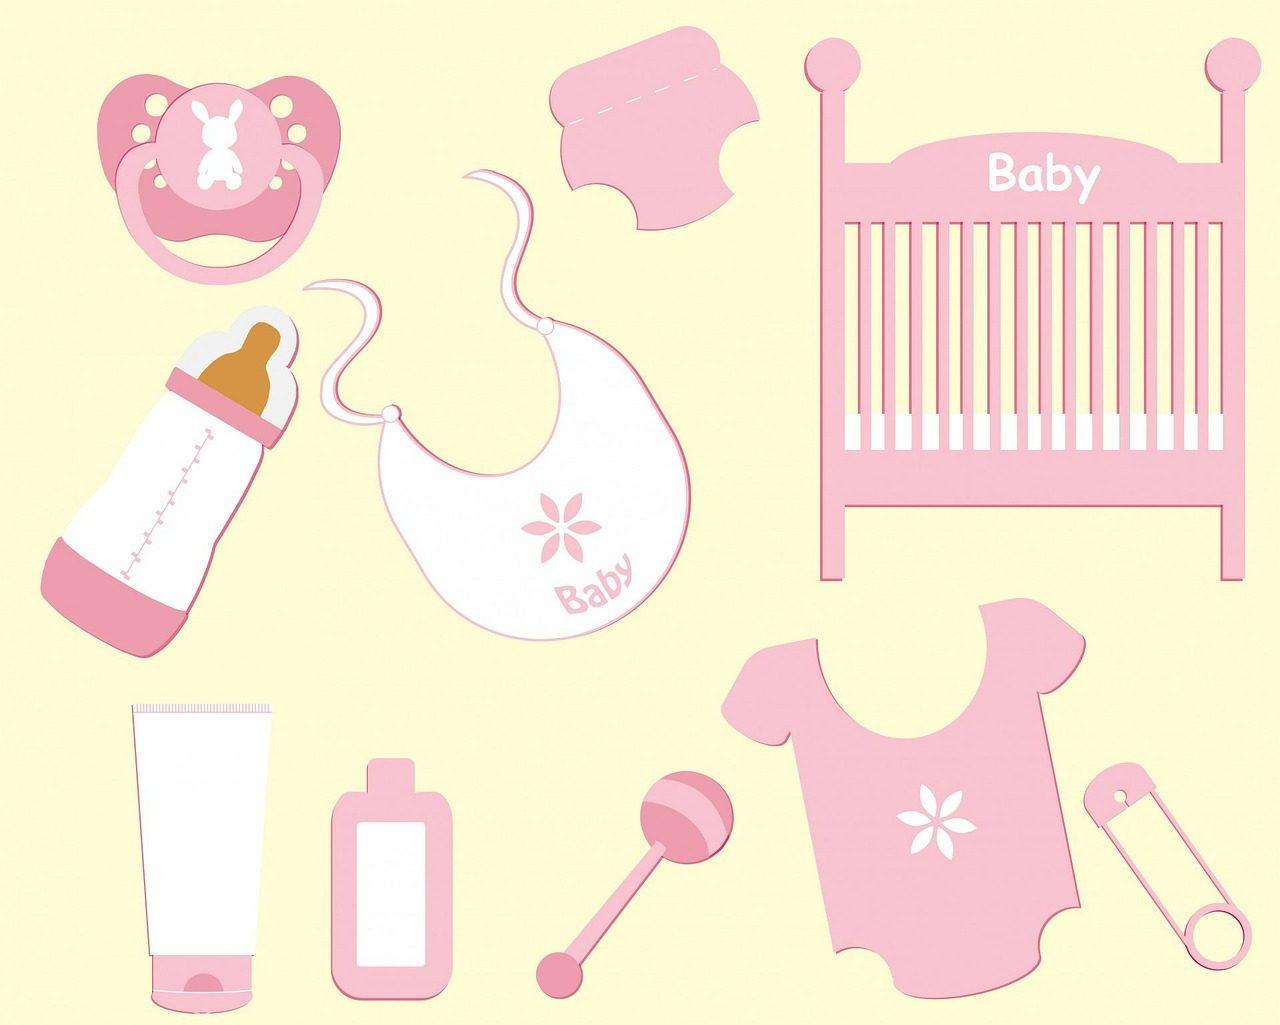 baby-220297_1280-1280x1025.jpg